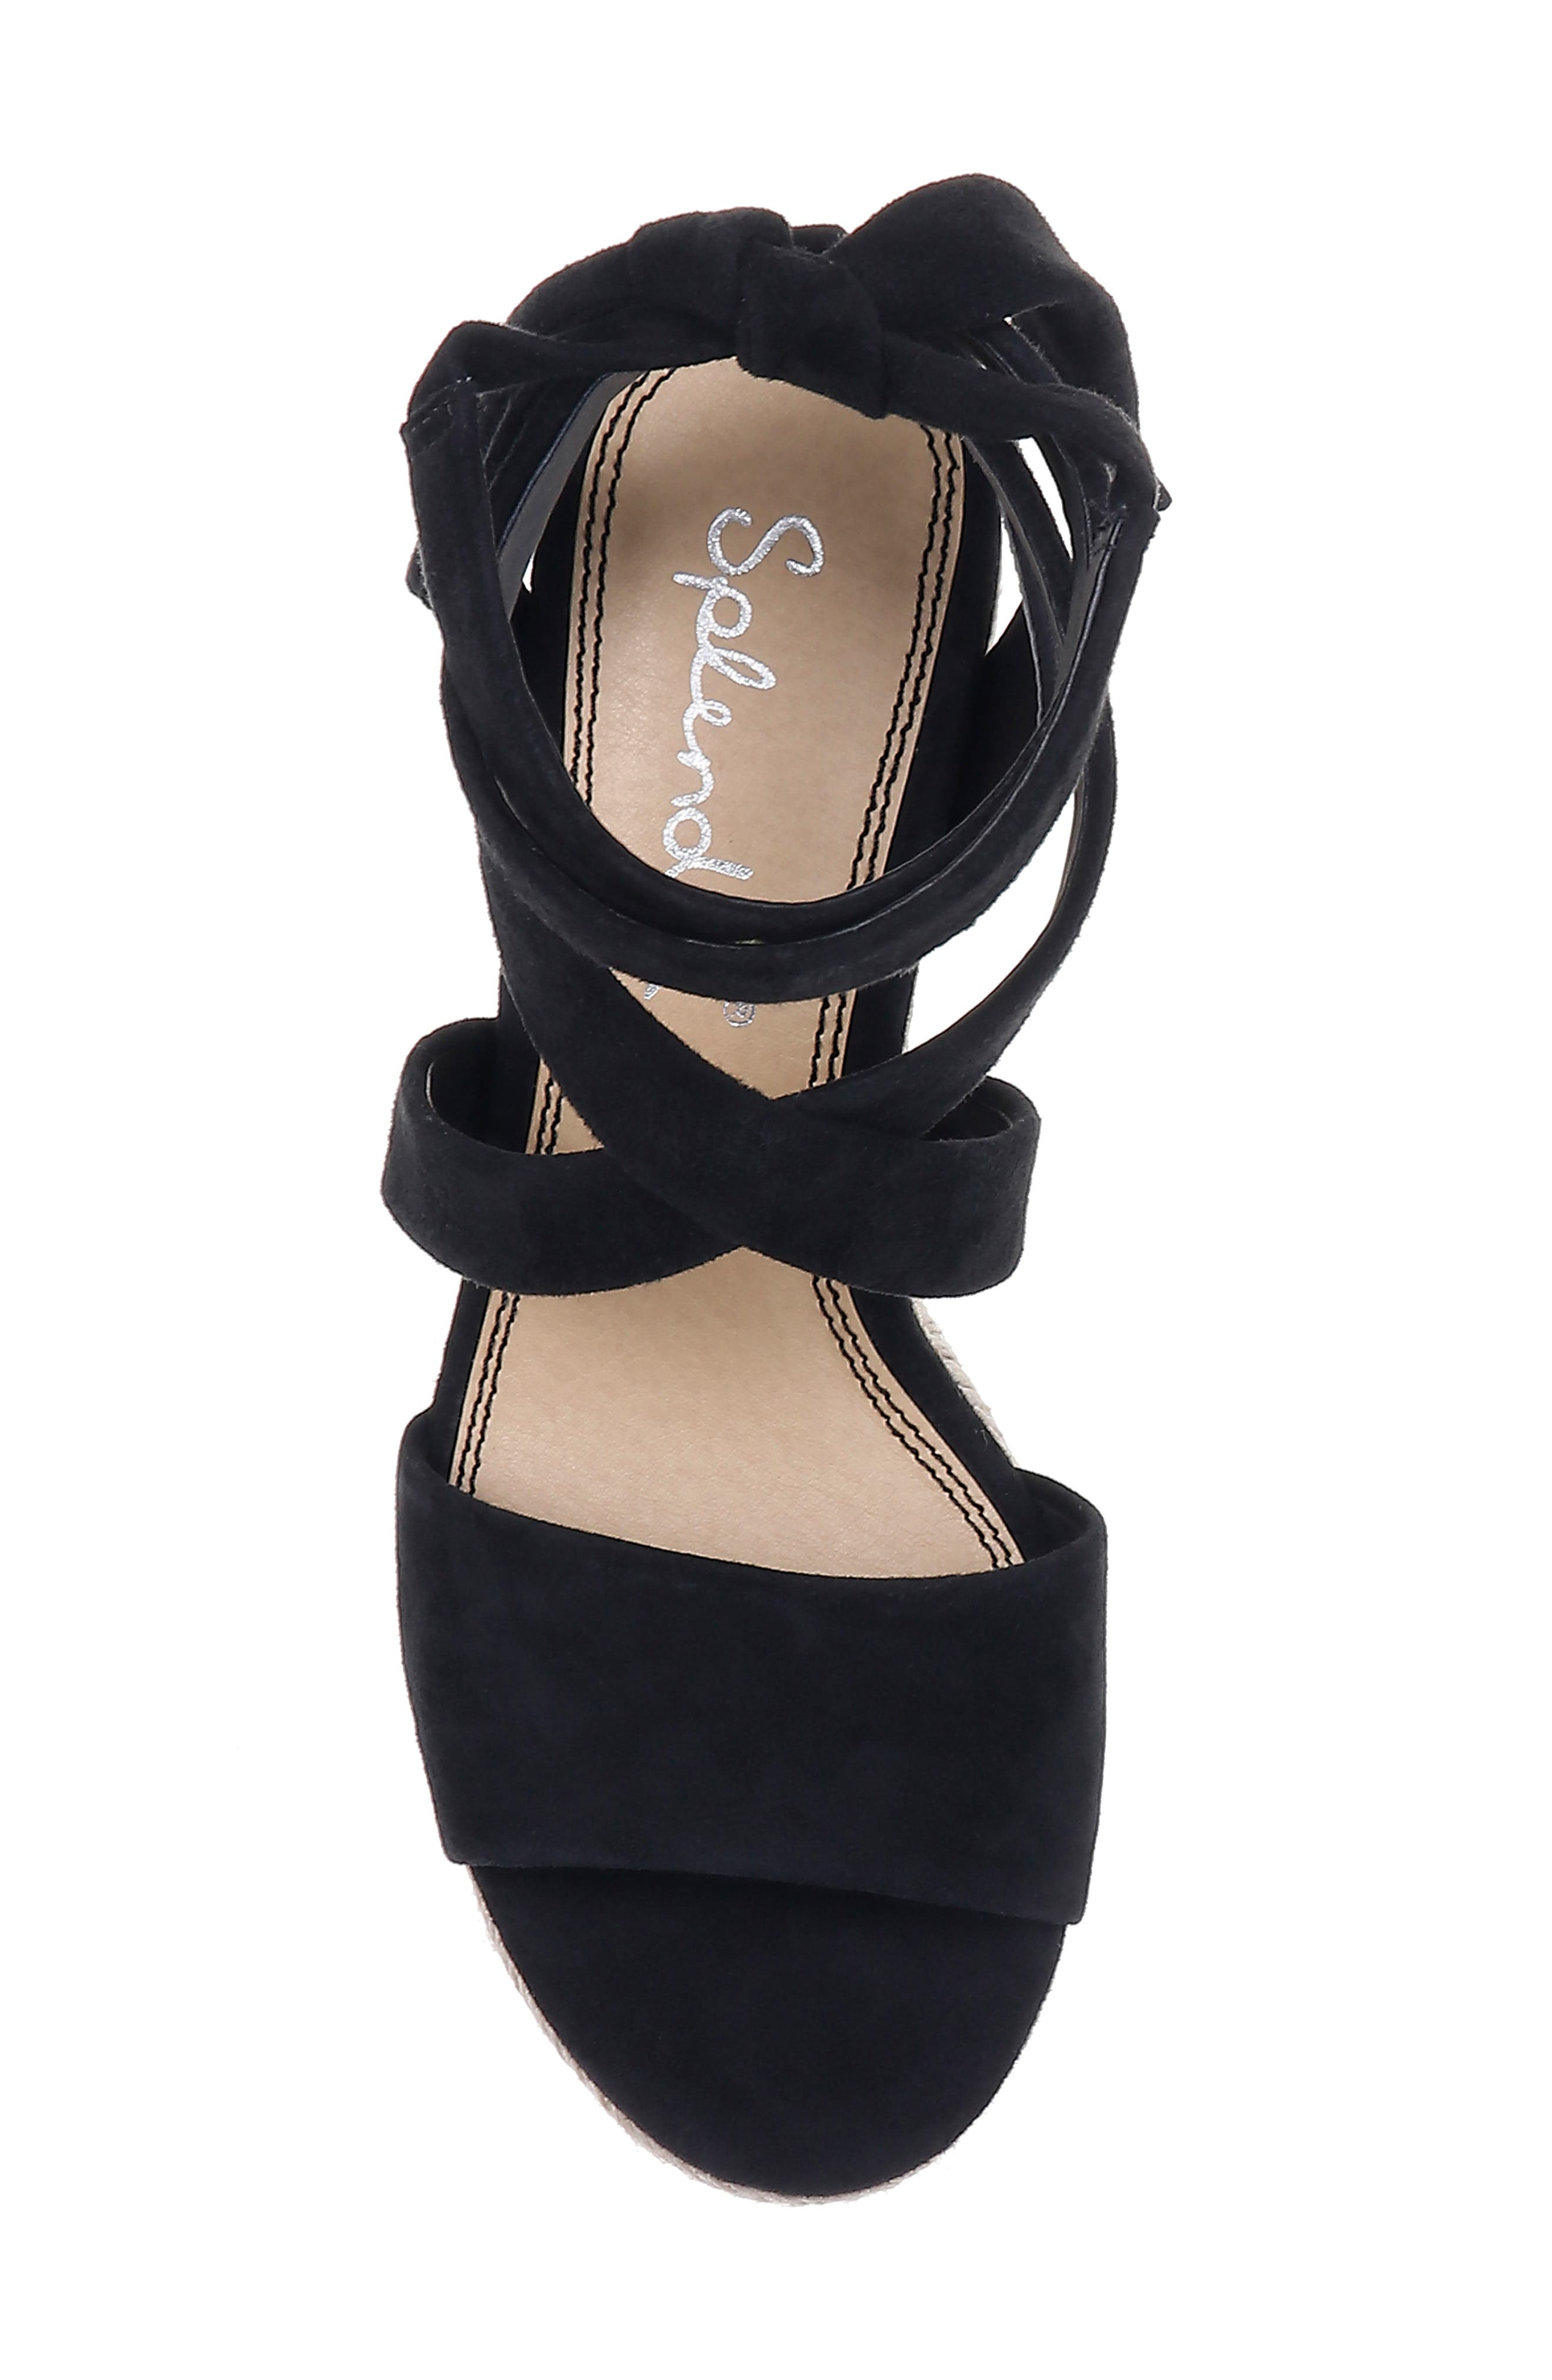 SPLENDID, Tessie Ankle Wrap Wedge Sandal, Alternate thumbnail 5, color, BLACK SUEDE